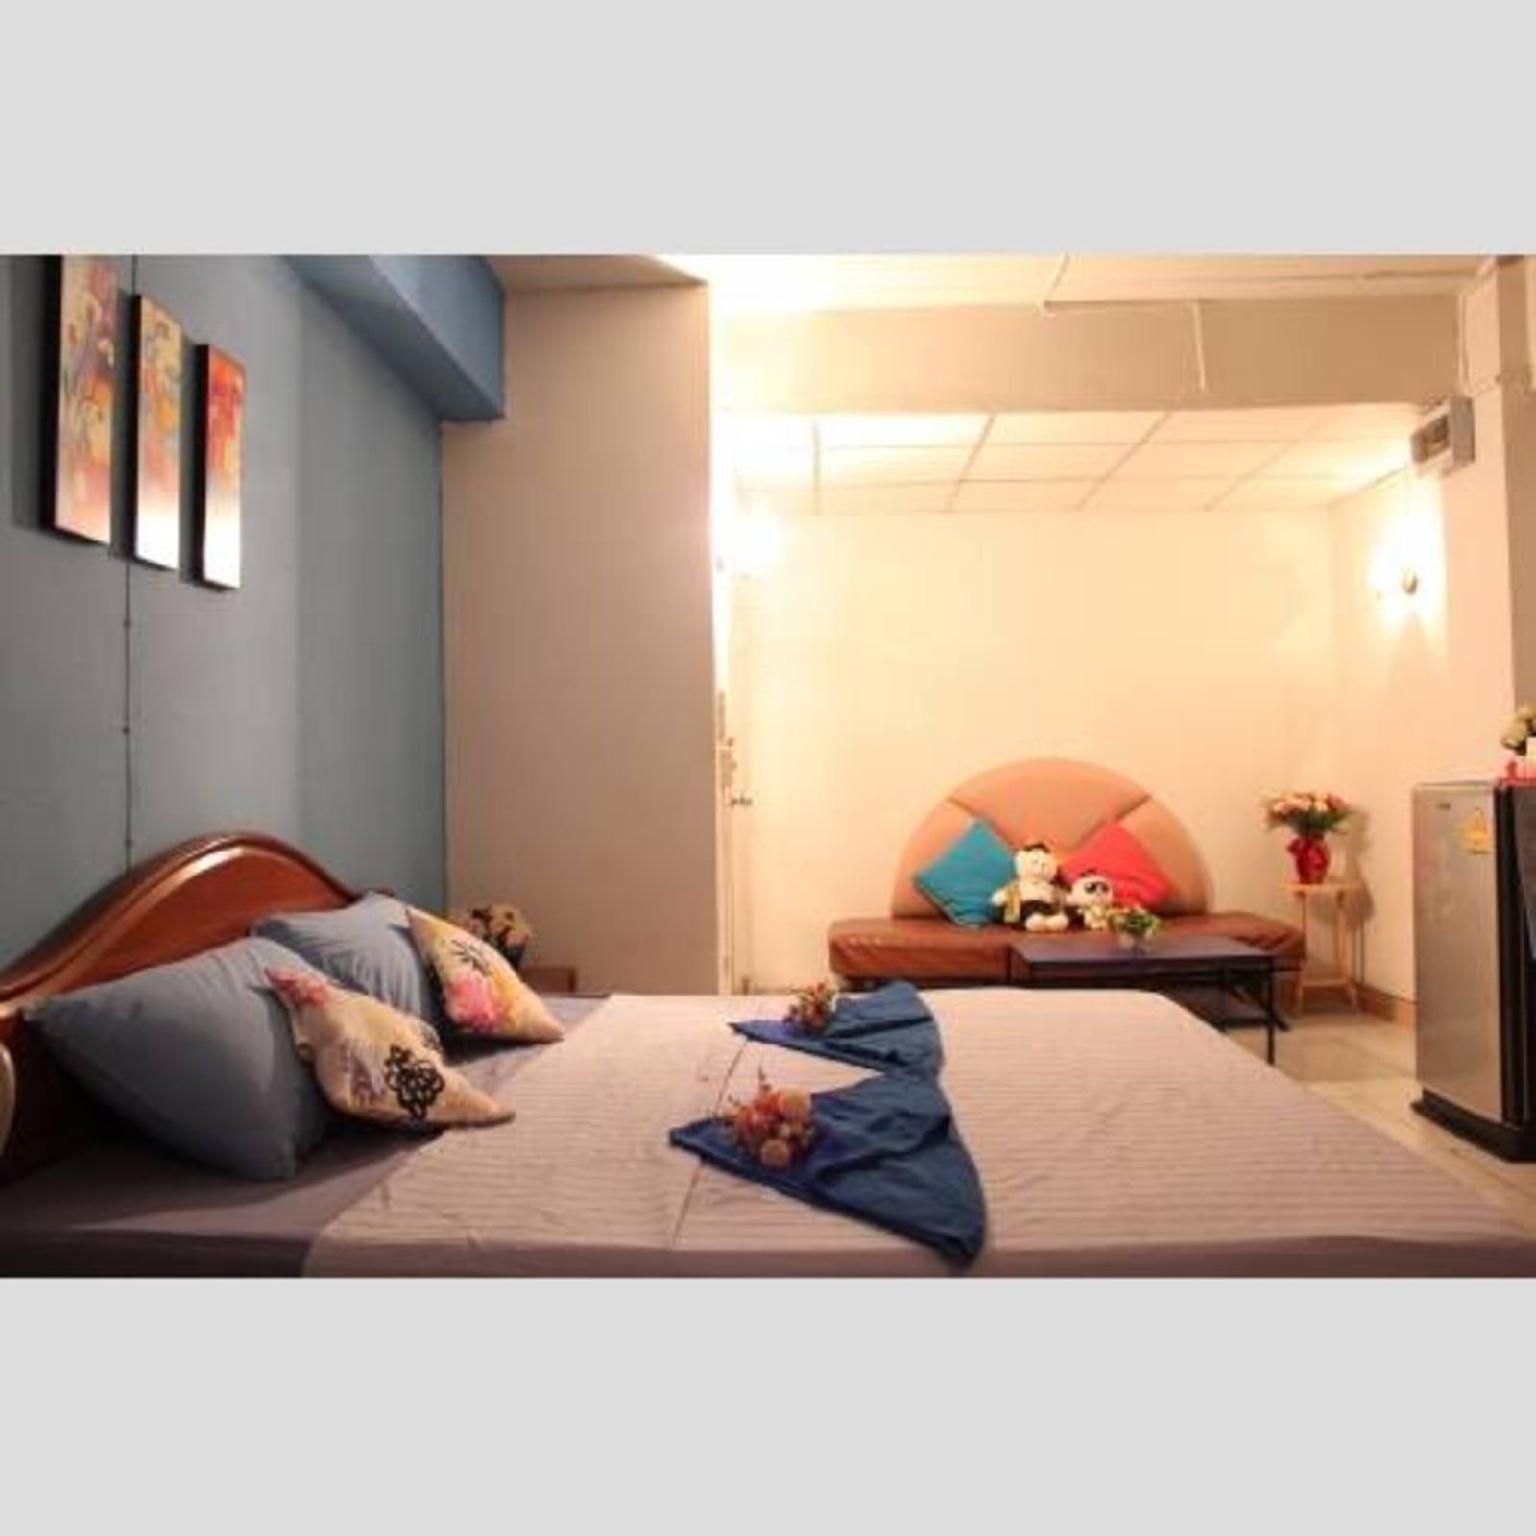 S U K mansion big room with sofa bed - 3 people